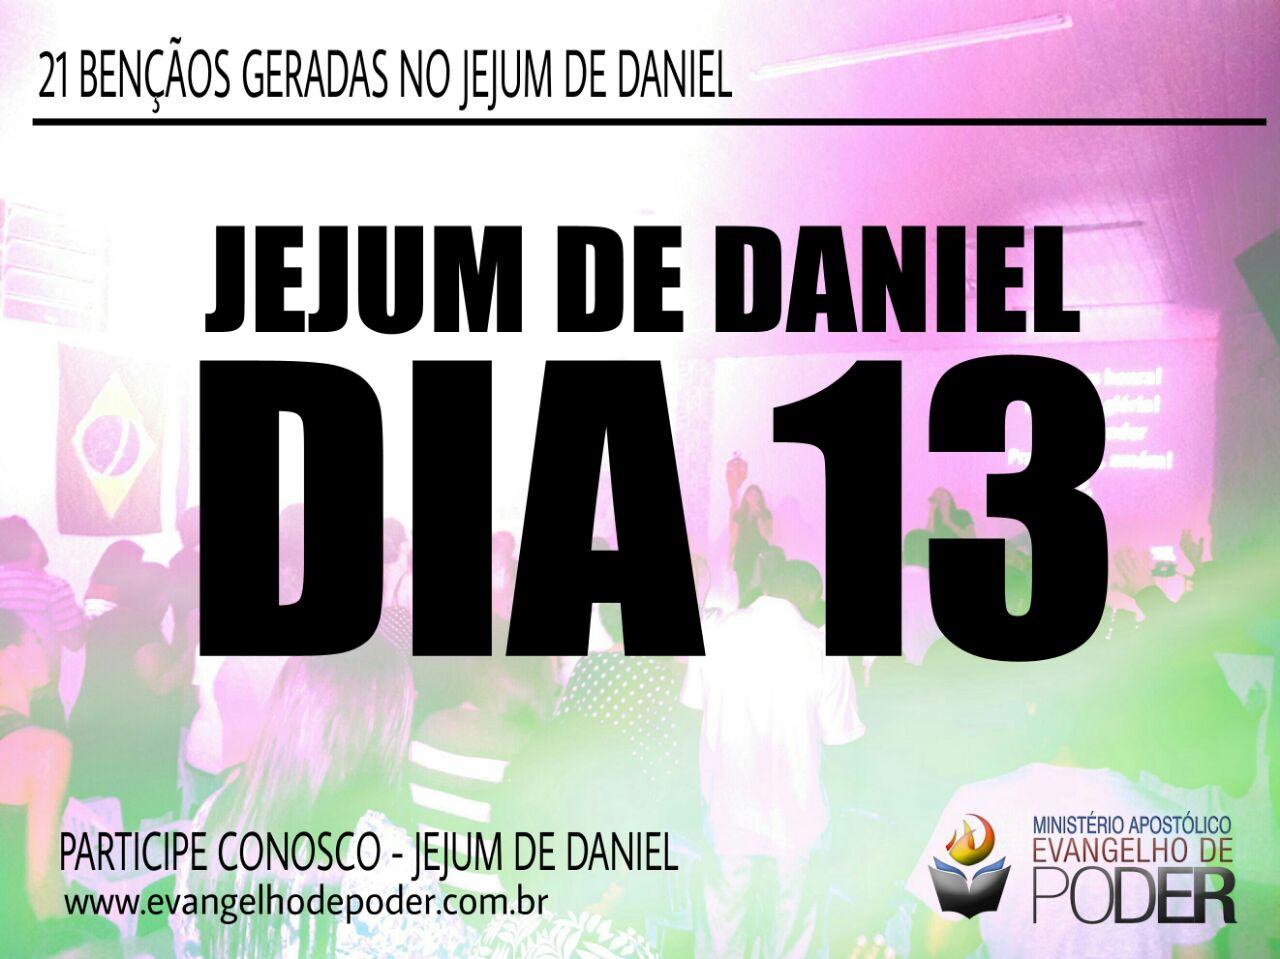 JEJUM DE DANIEL 13° DIA